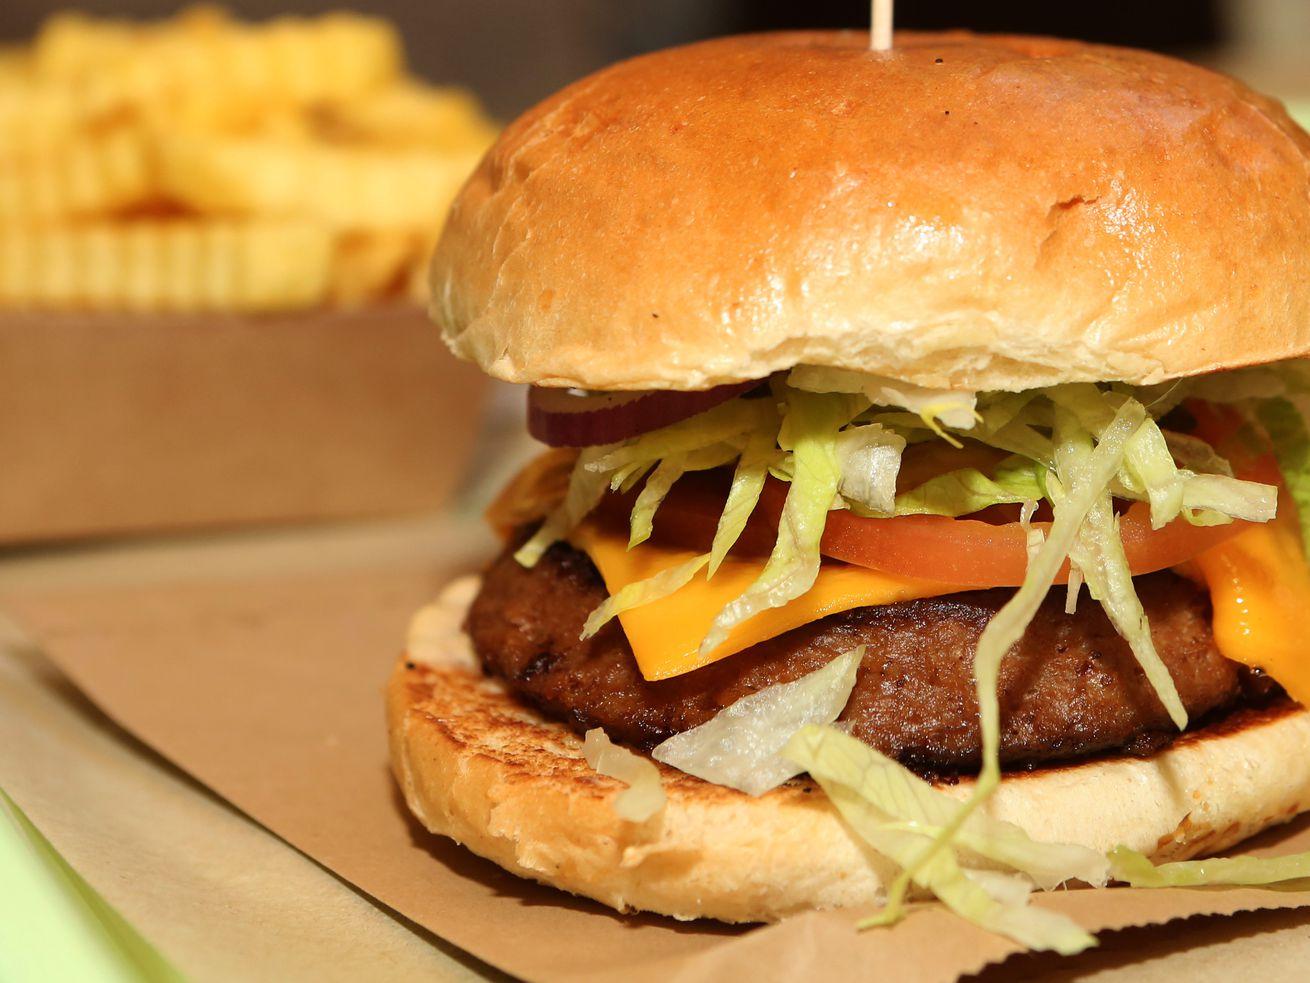 Meatless Burgers Gain In Popularity